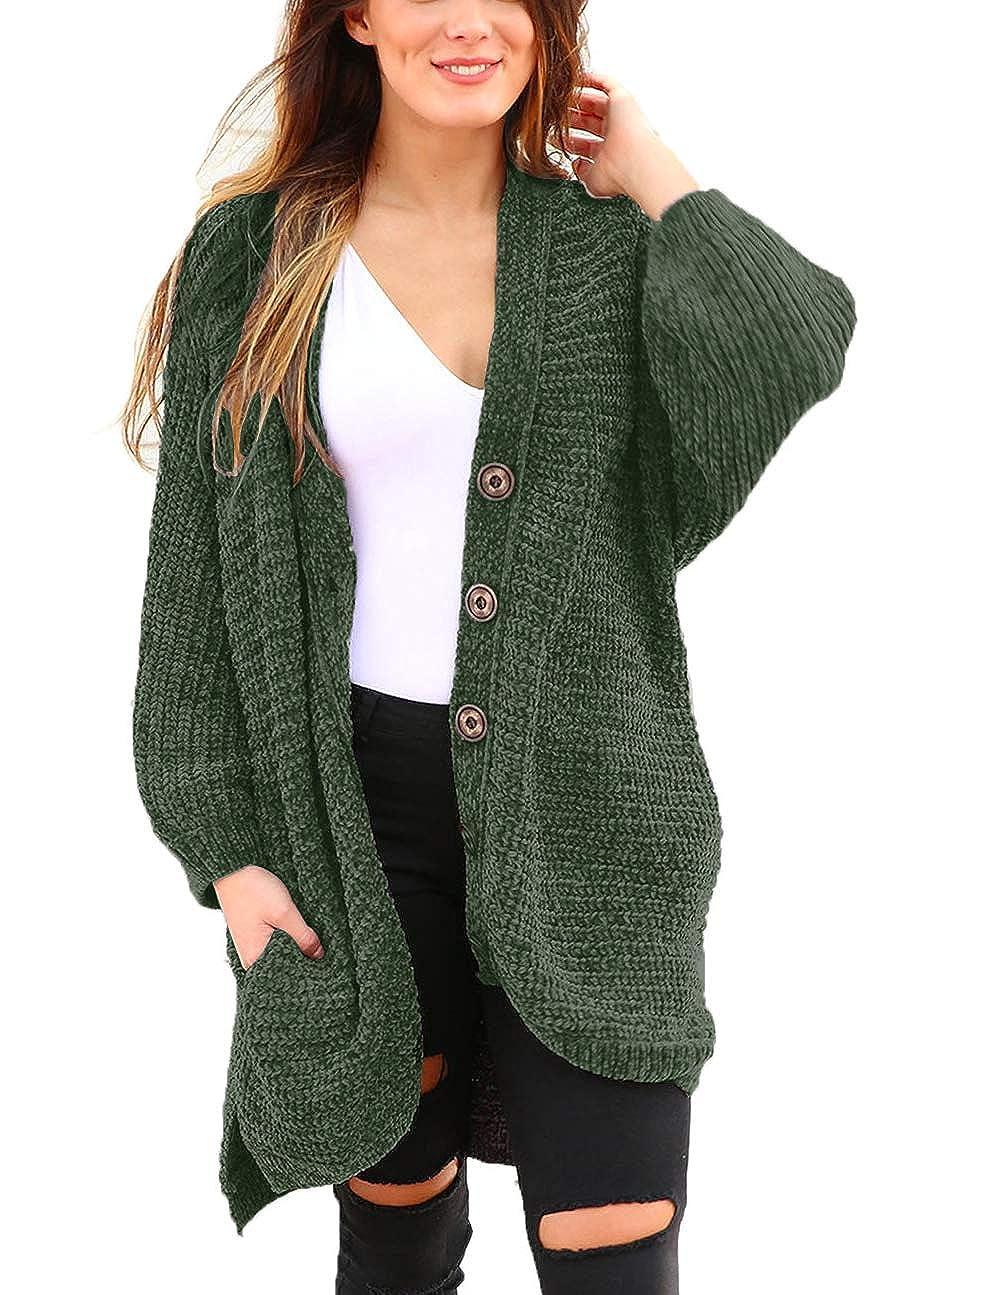 LUCKLOVELL Women Dark Green Chenille Buttoned Sweater Cardiga